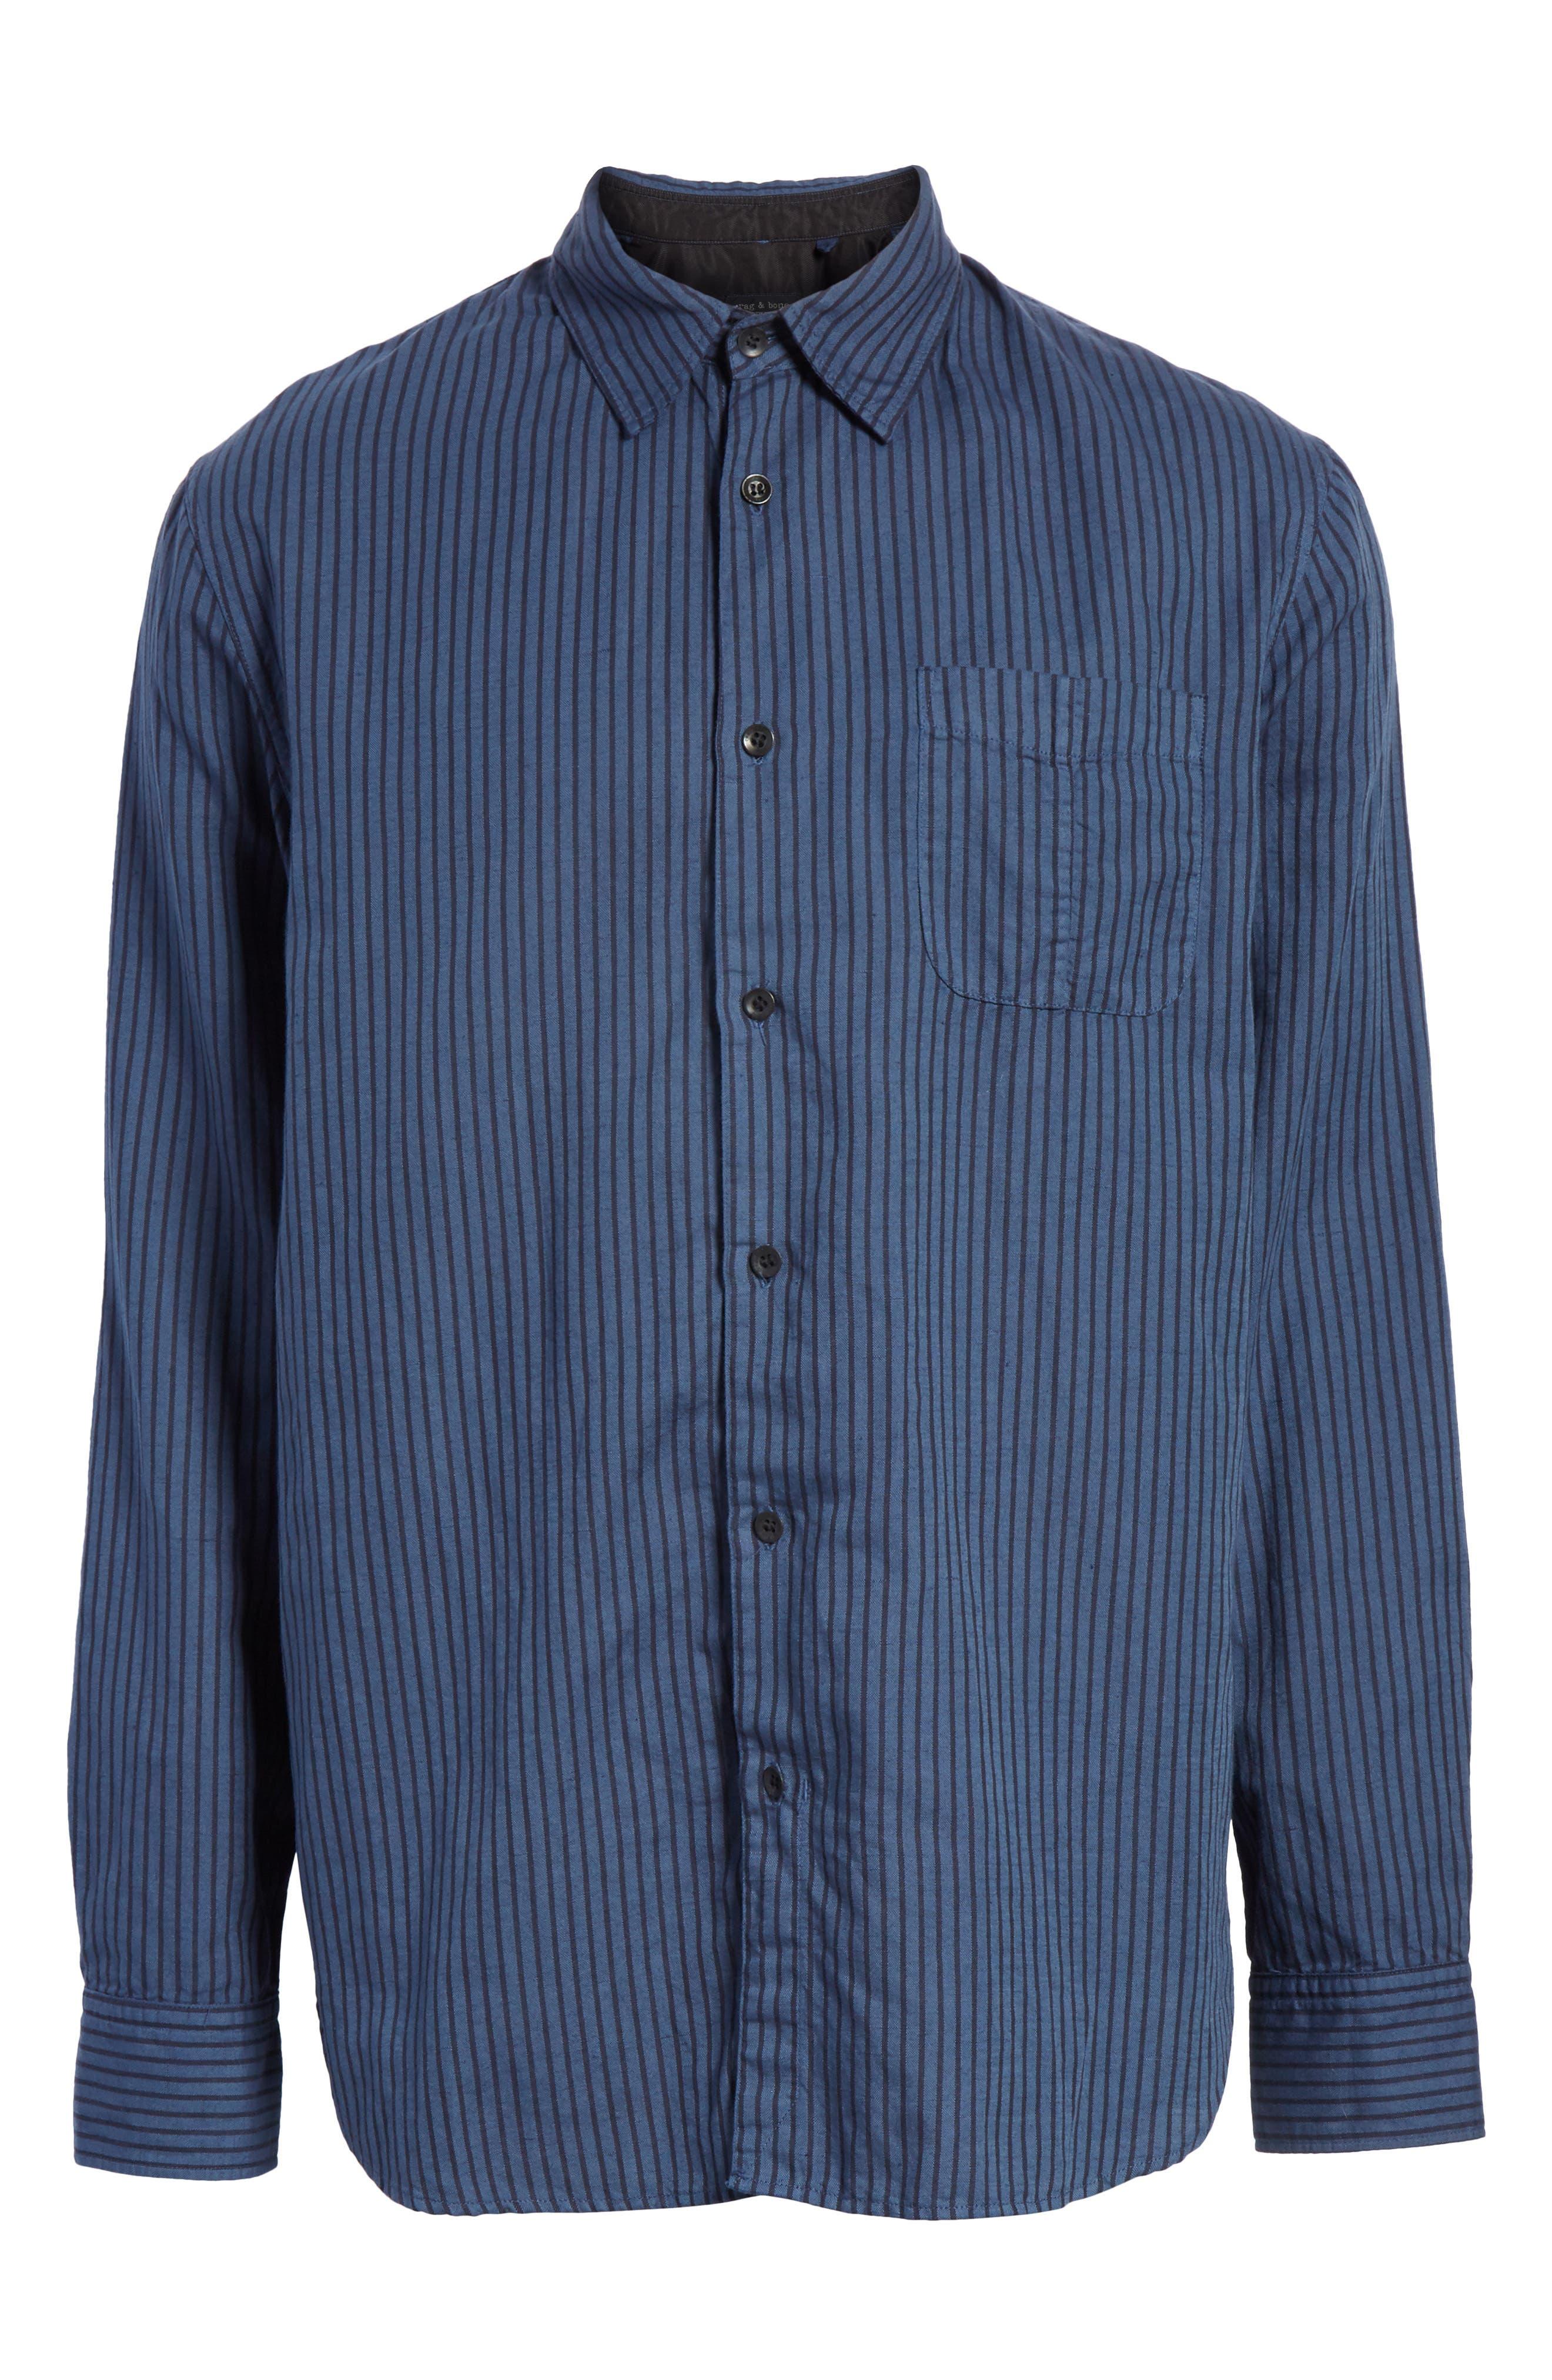 Beach Fit 3 Stripe Shirt,                             Alternate thumbnail 6, color,                             416